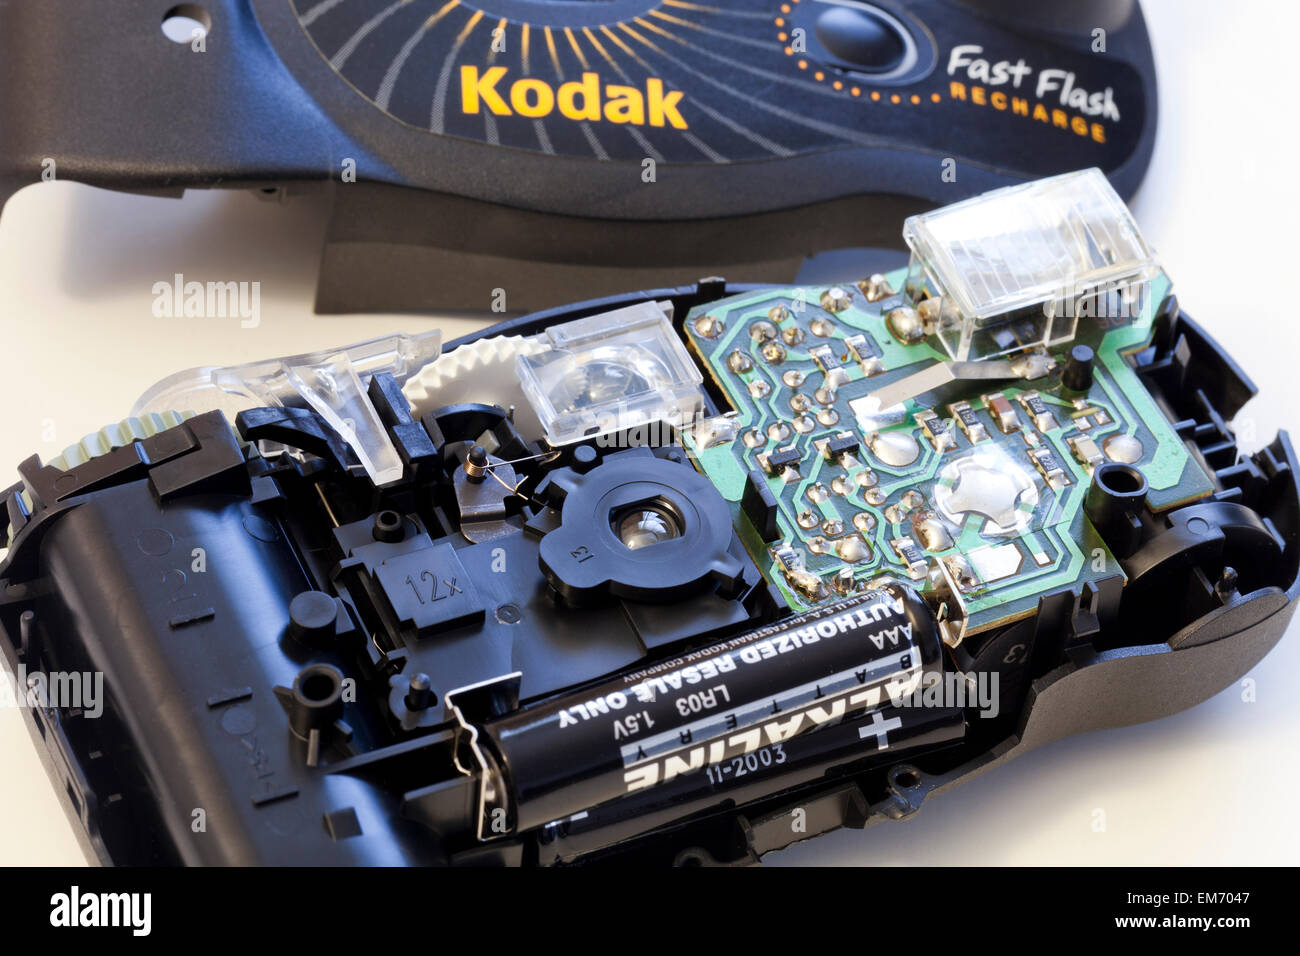 Disassembled Kodak Advantix APS disposable camera - USA - Stock Image